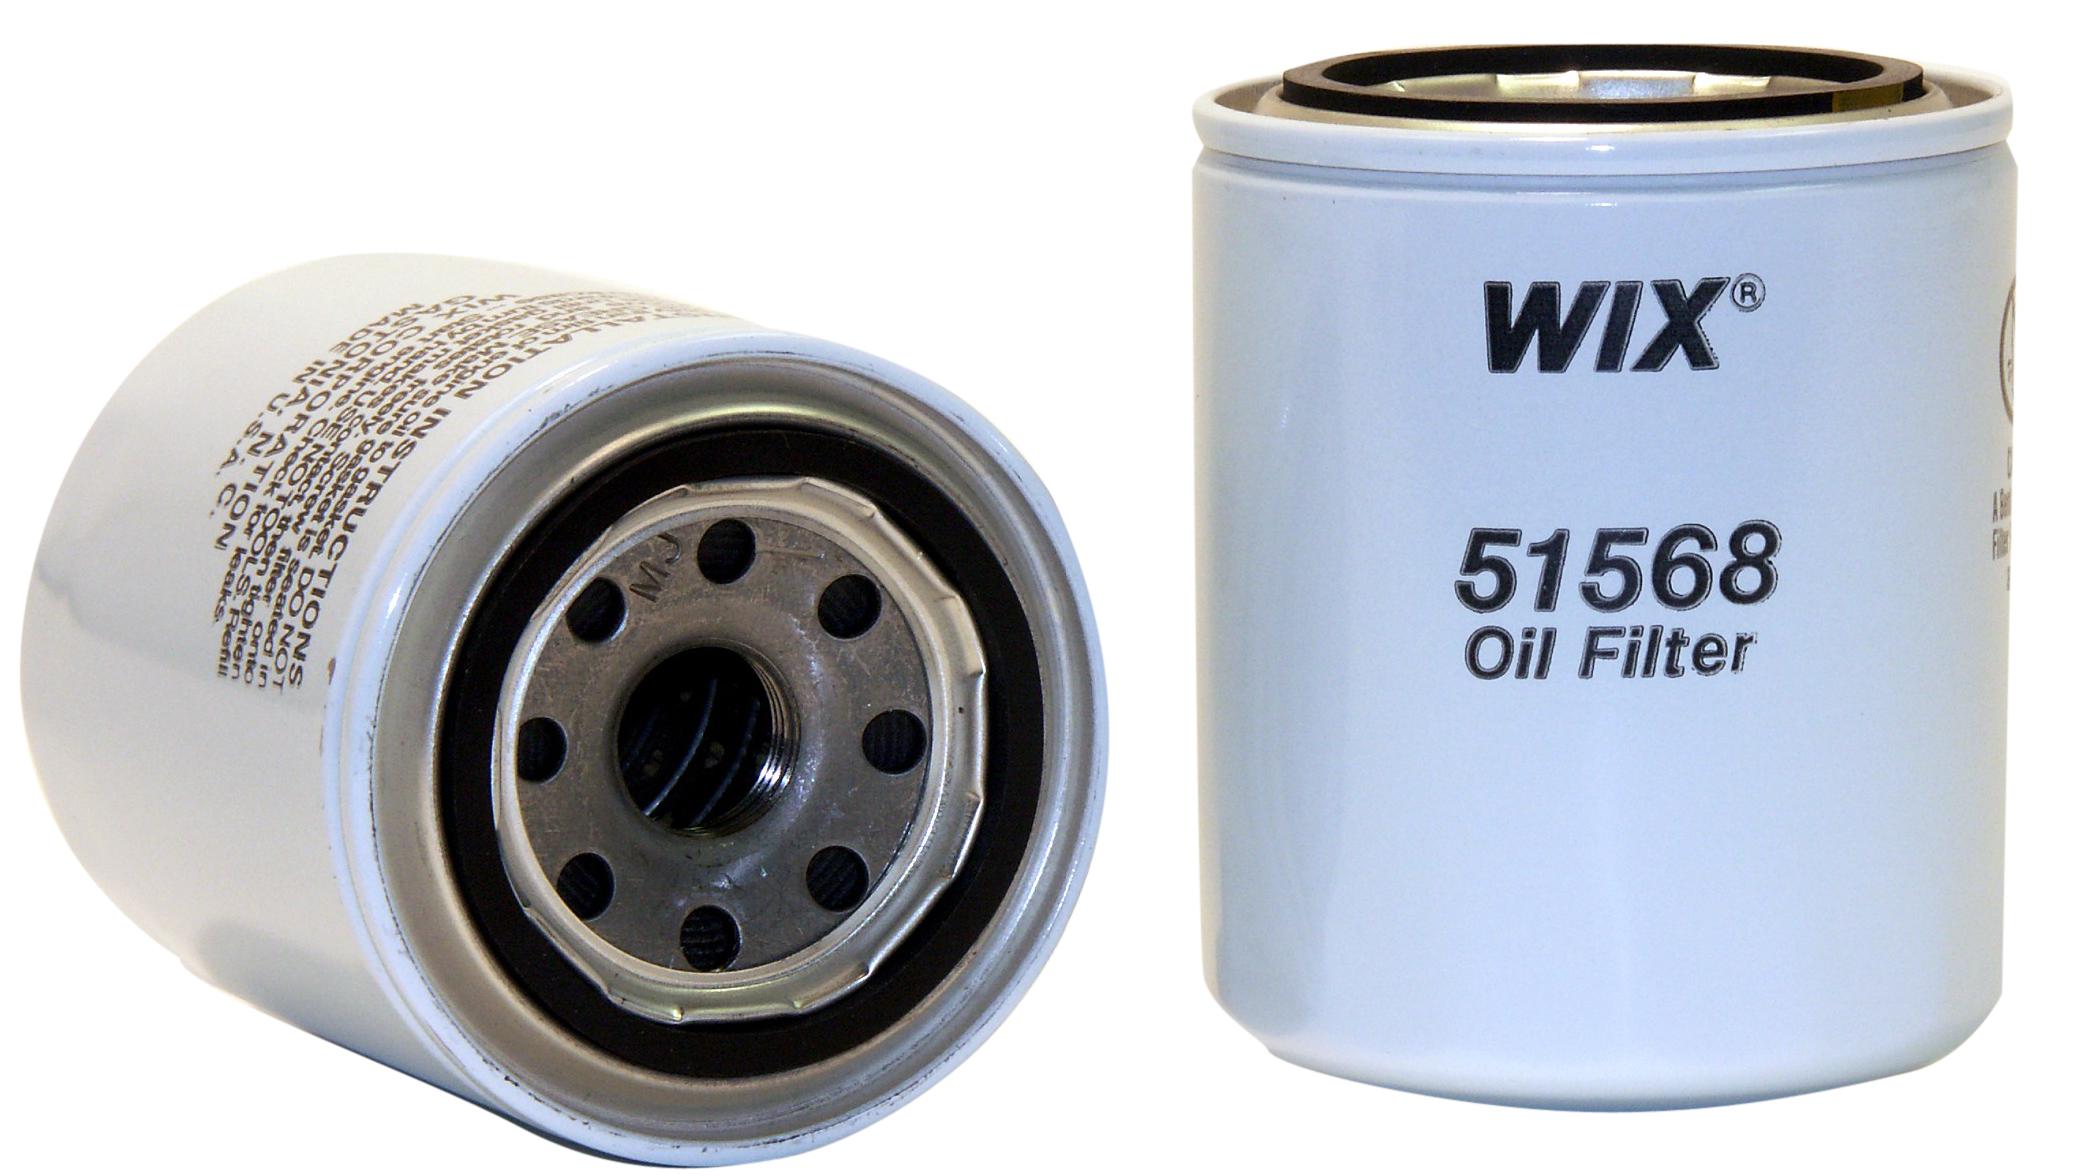 Wix oljefilter 51568